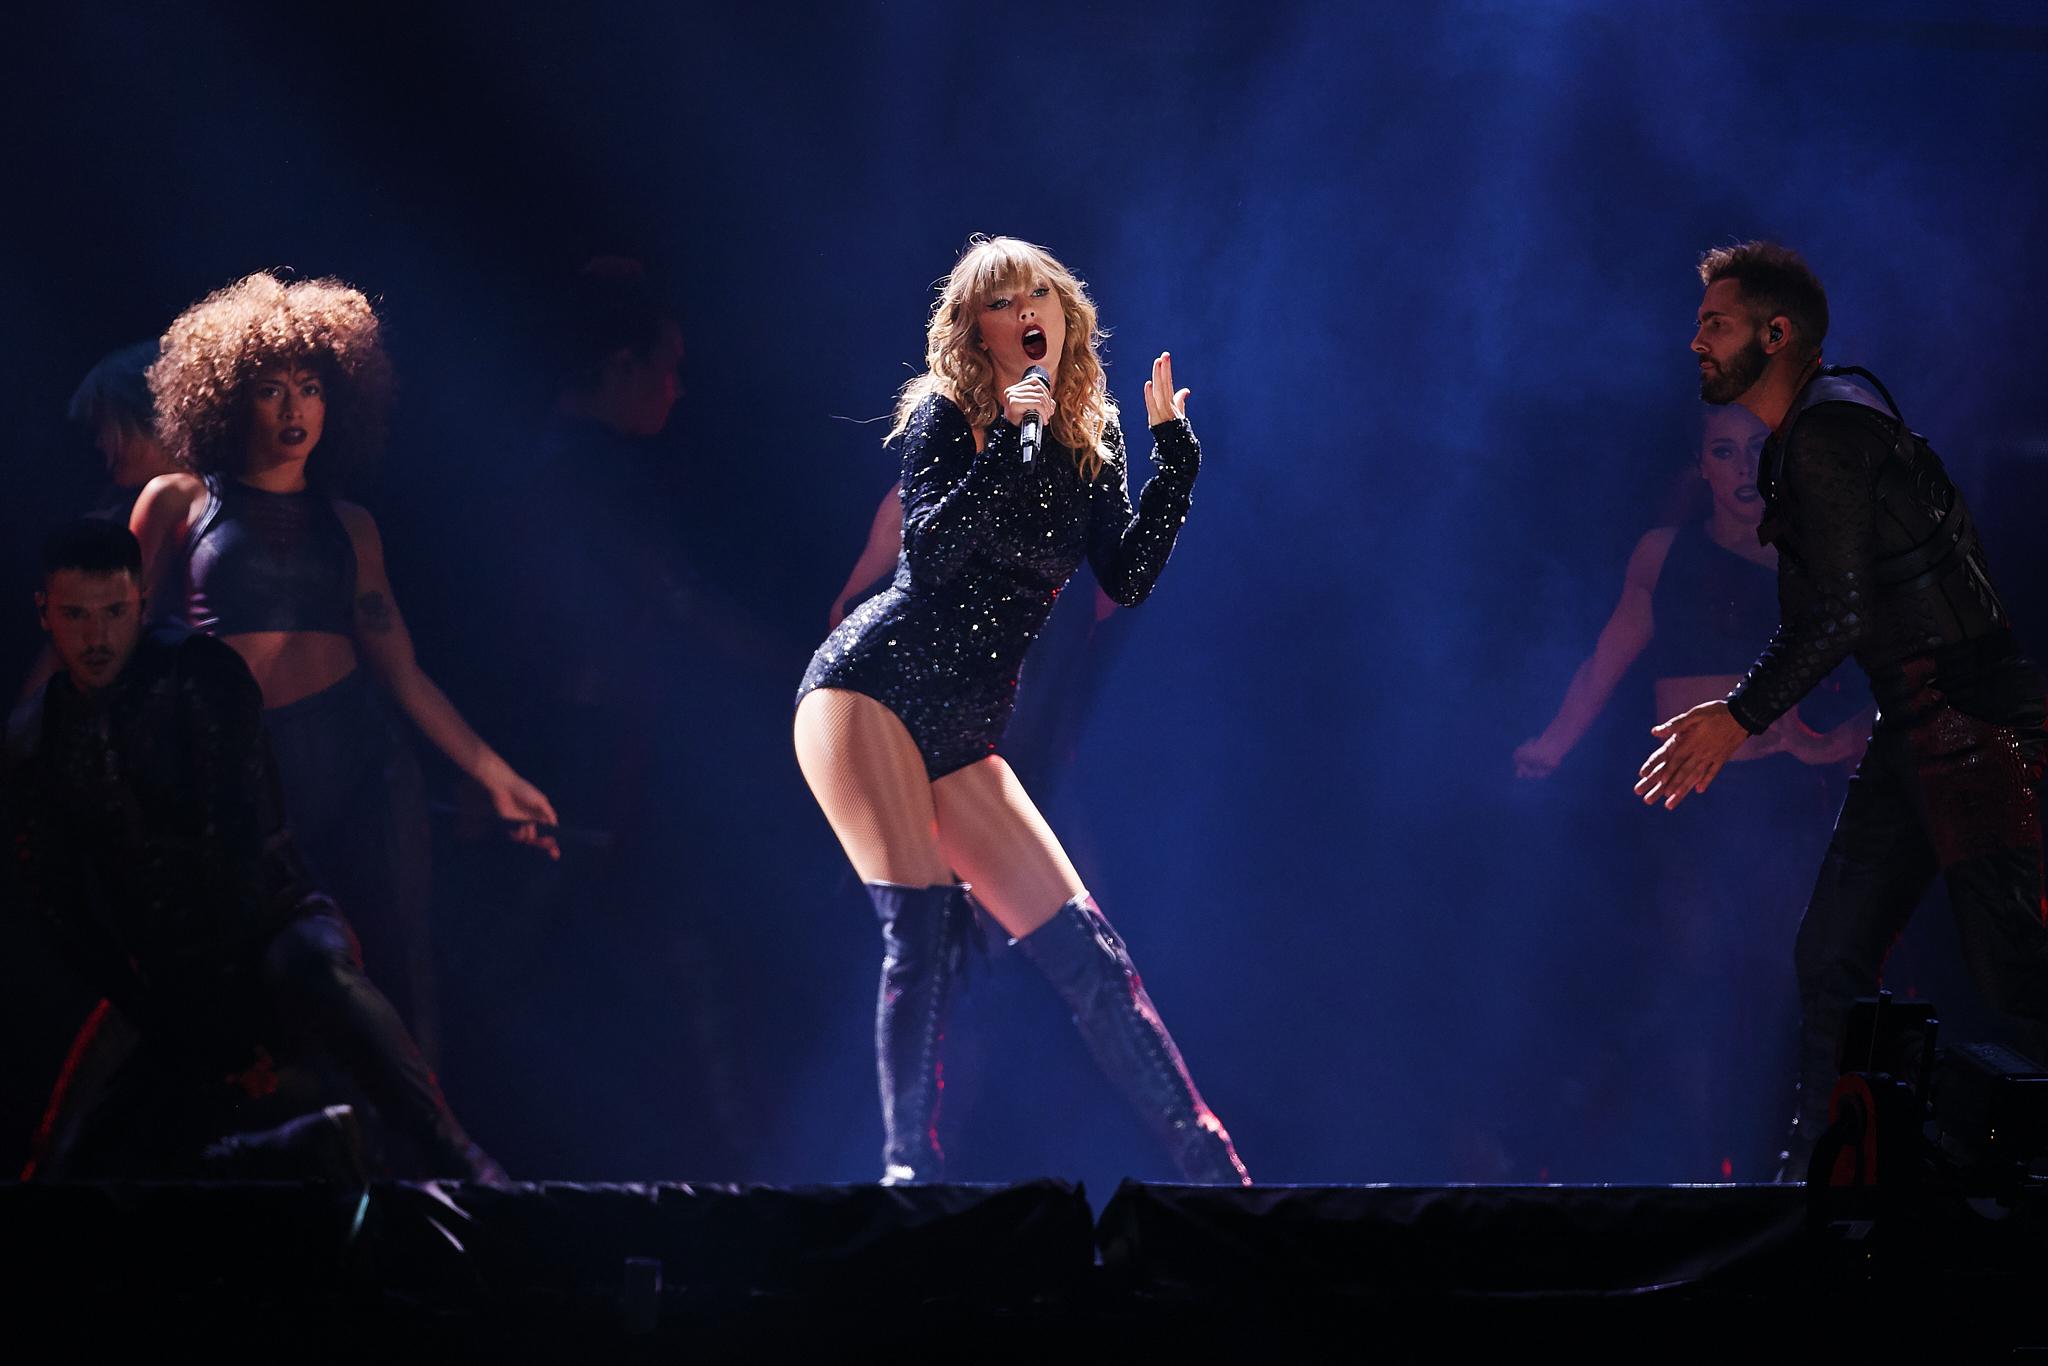 Taylor_Swift_at_US_Bank_Stadium_08-31-2018_Photo_By_Joe_Lemke_024.jpg